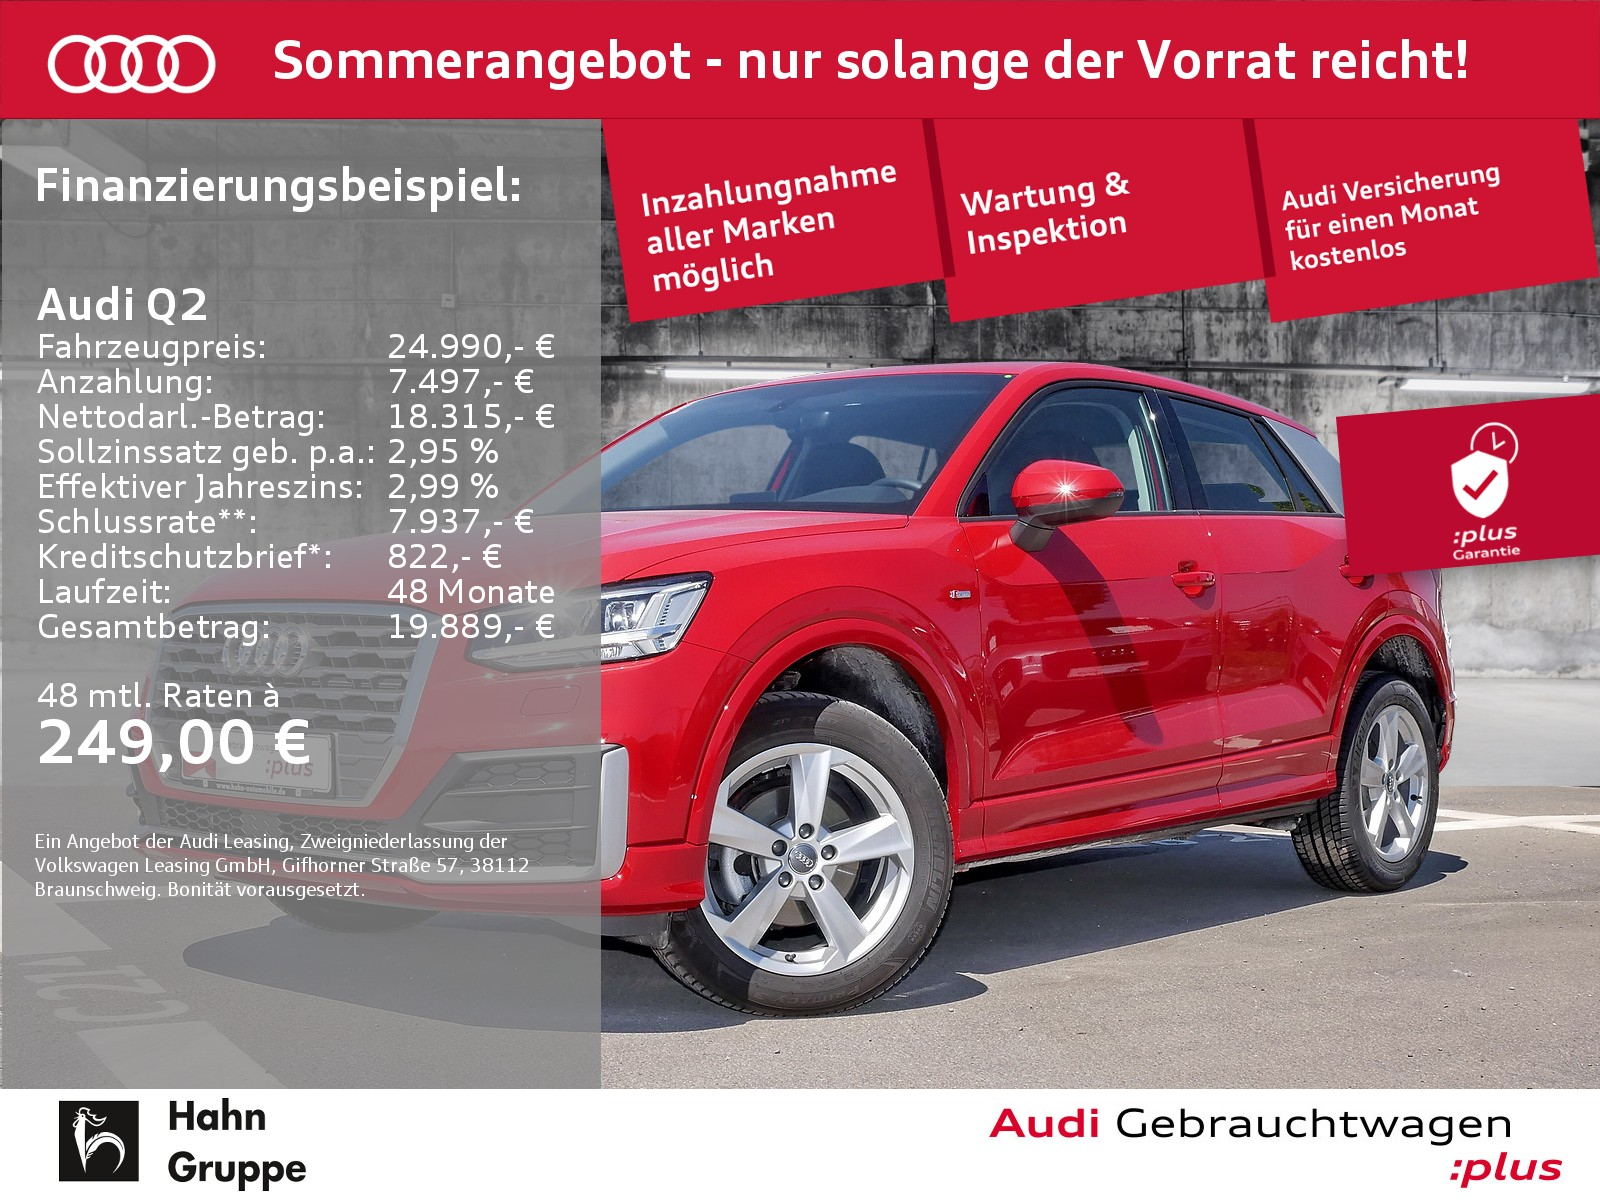 Audi Q2 30TDI EU6d Sline LED Navi AHK Einpark Sitzh, Jahr 2020, Diesel